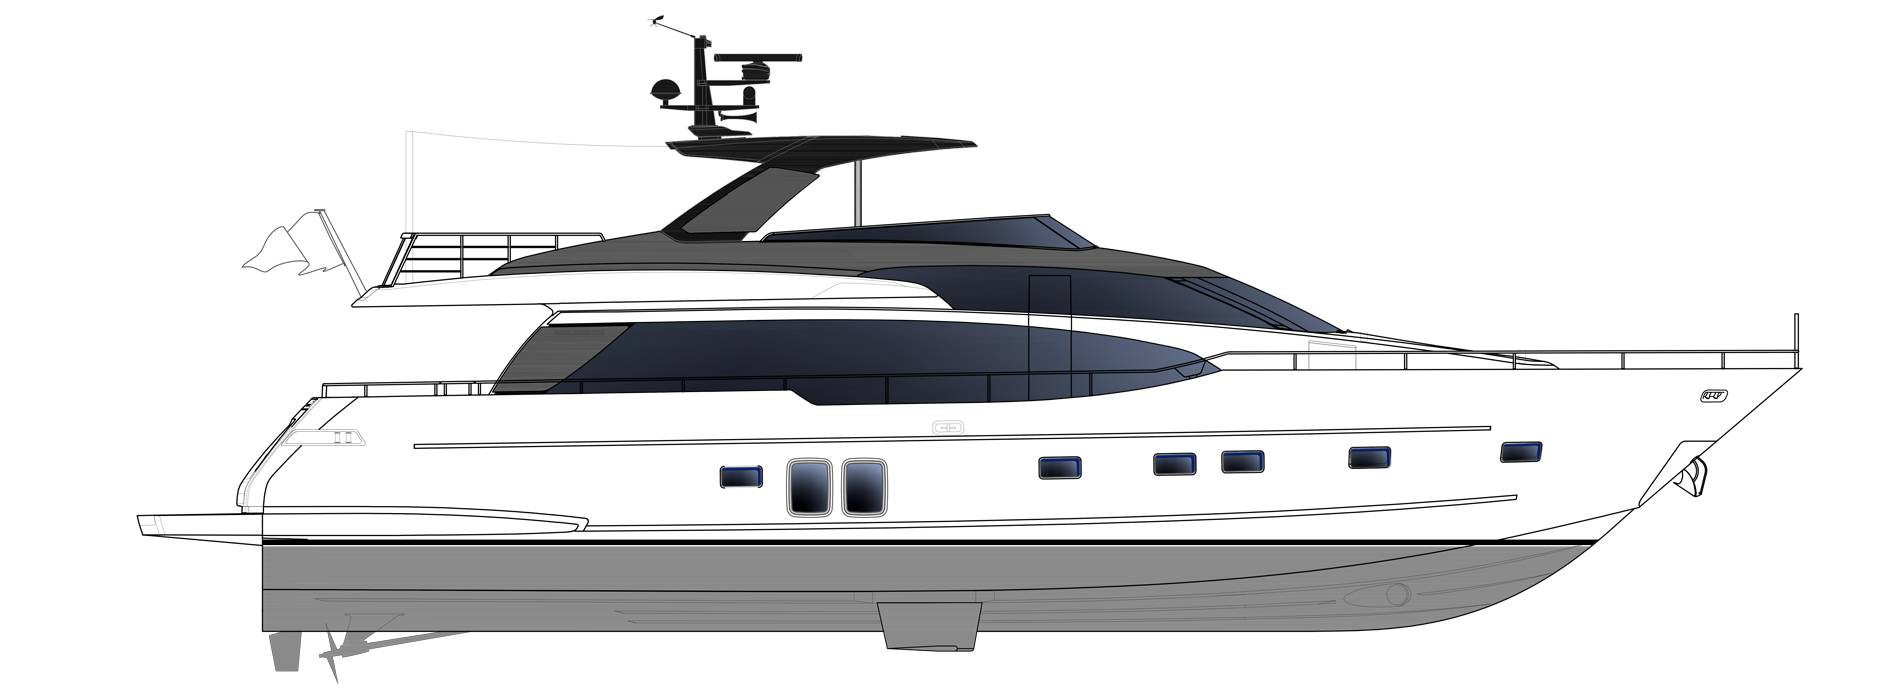 Sanlorenzo Yachts SL78-695 Profile